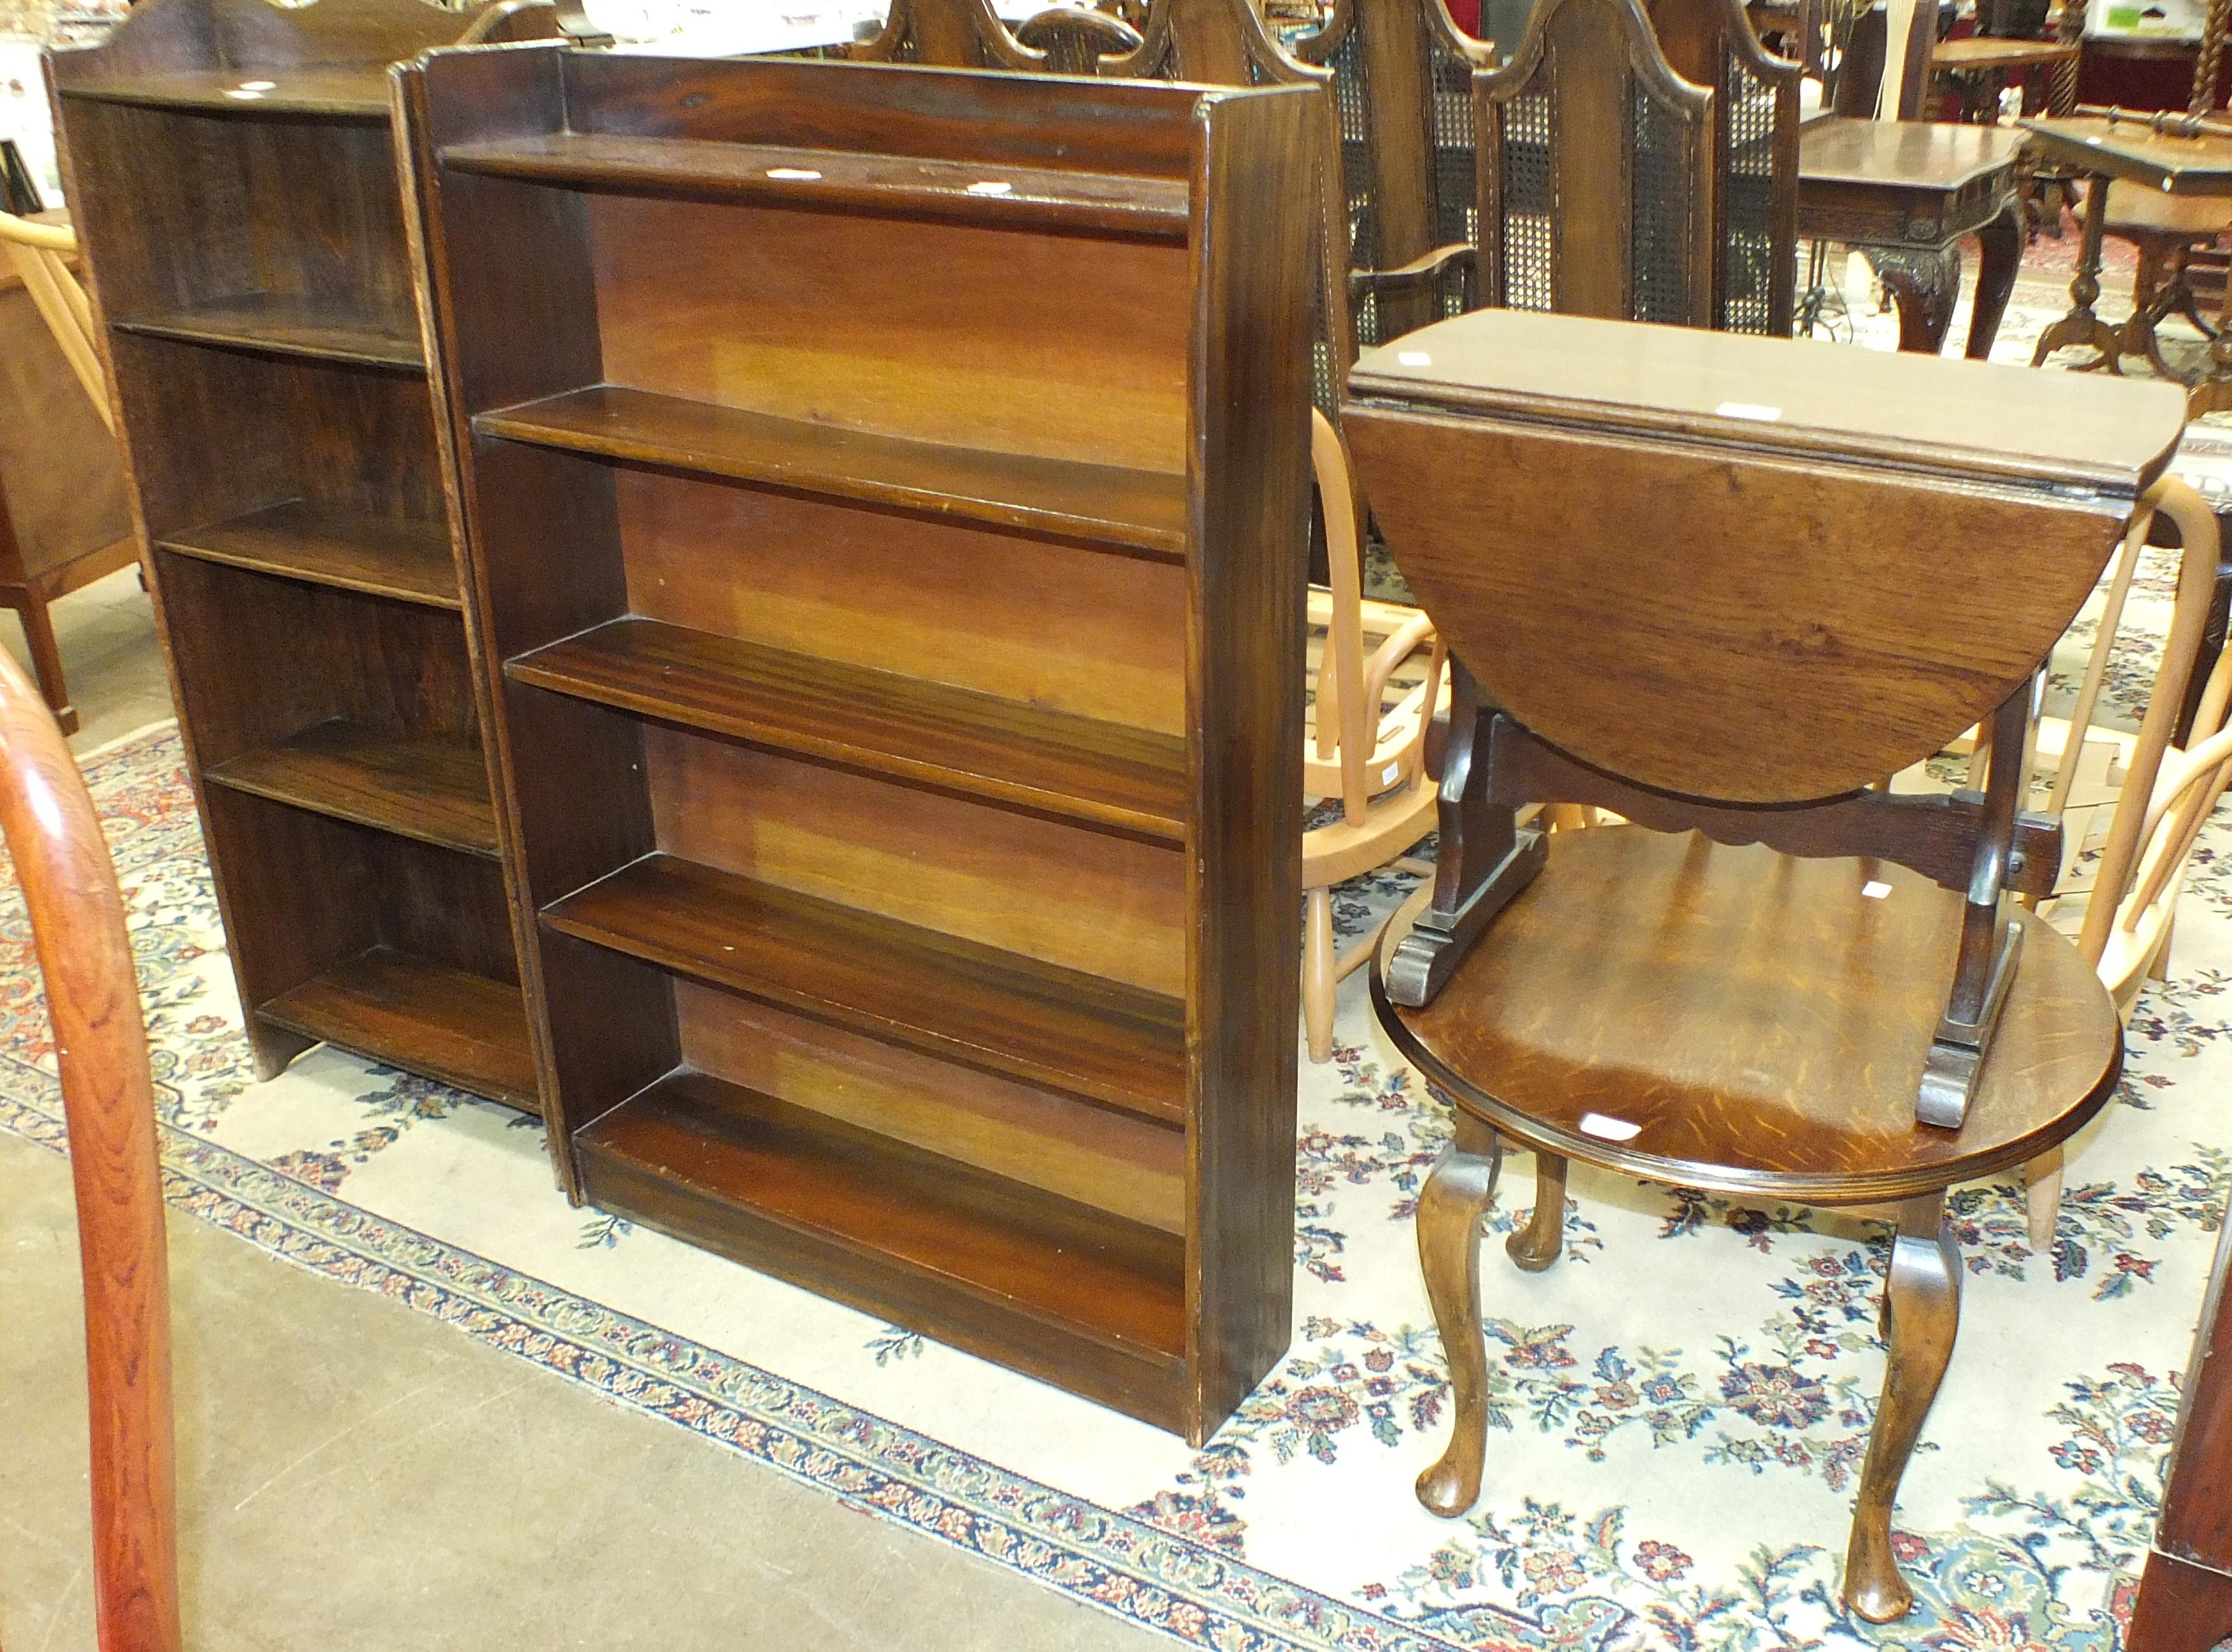 A set of wooden open bookshelves, 76cm wide, 110cm high, a set of small oak shelves, a small oak